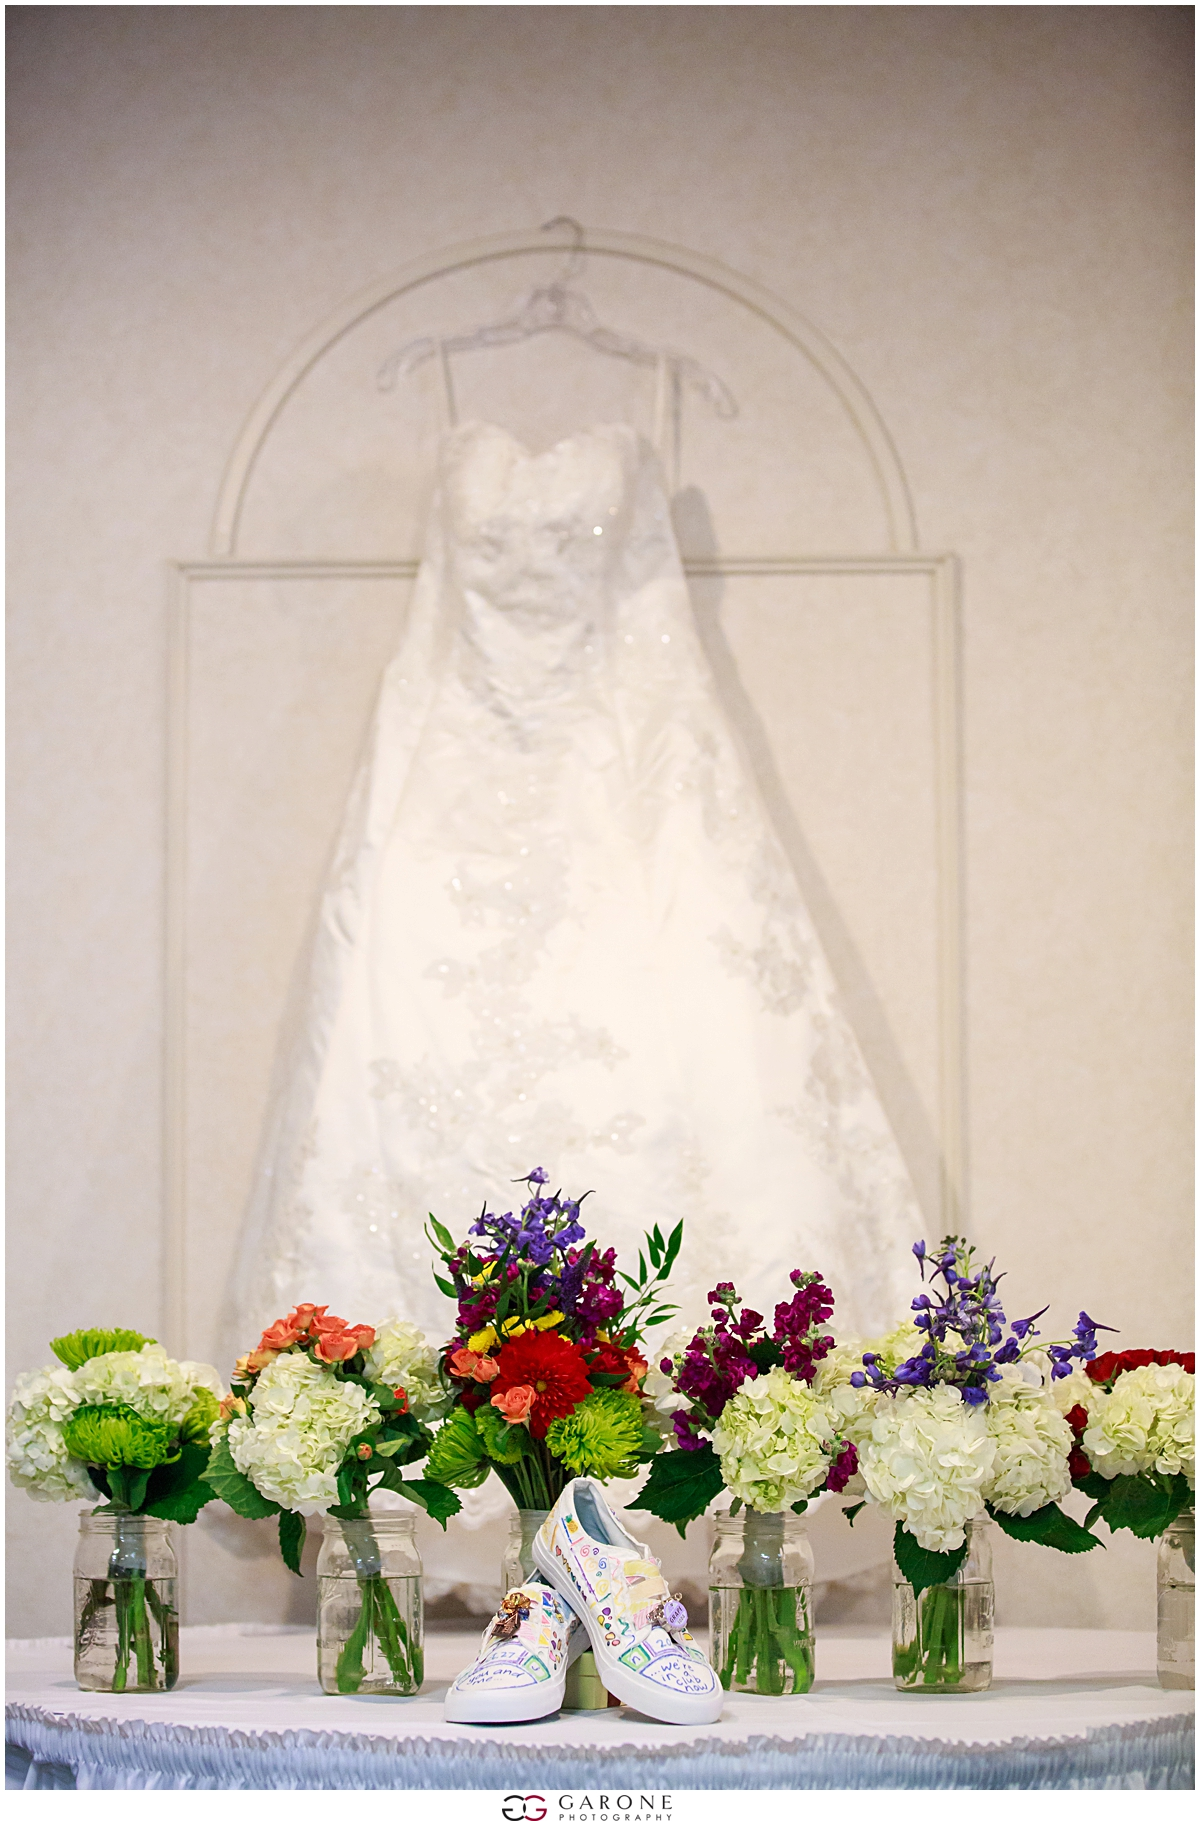 Jenna_Nicole_Castleton_Wedding_Love_is_love_NH_Wedding_Photographer_Garone_Photography_0007.jpg